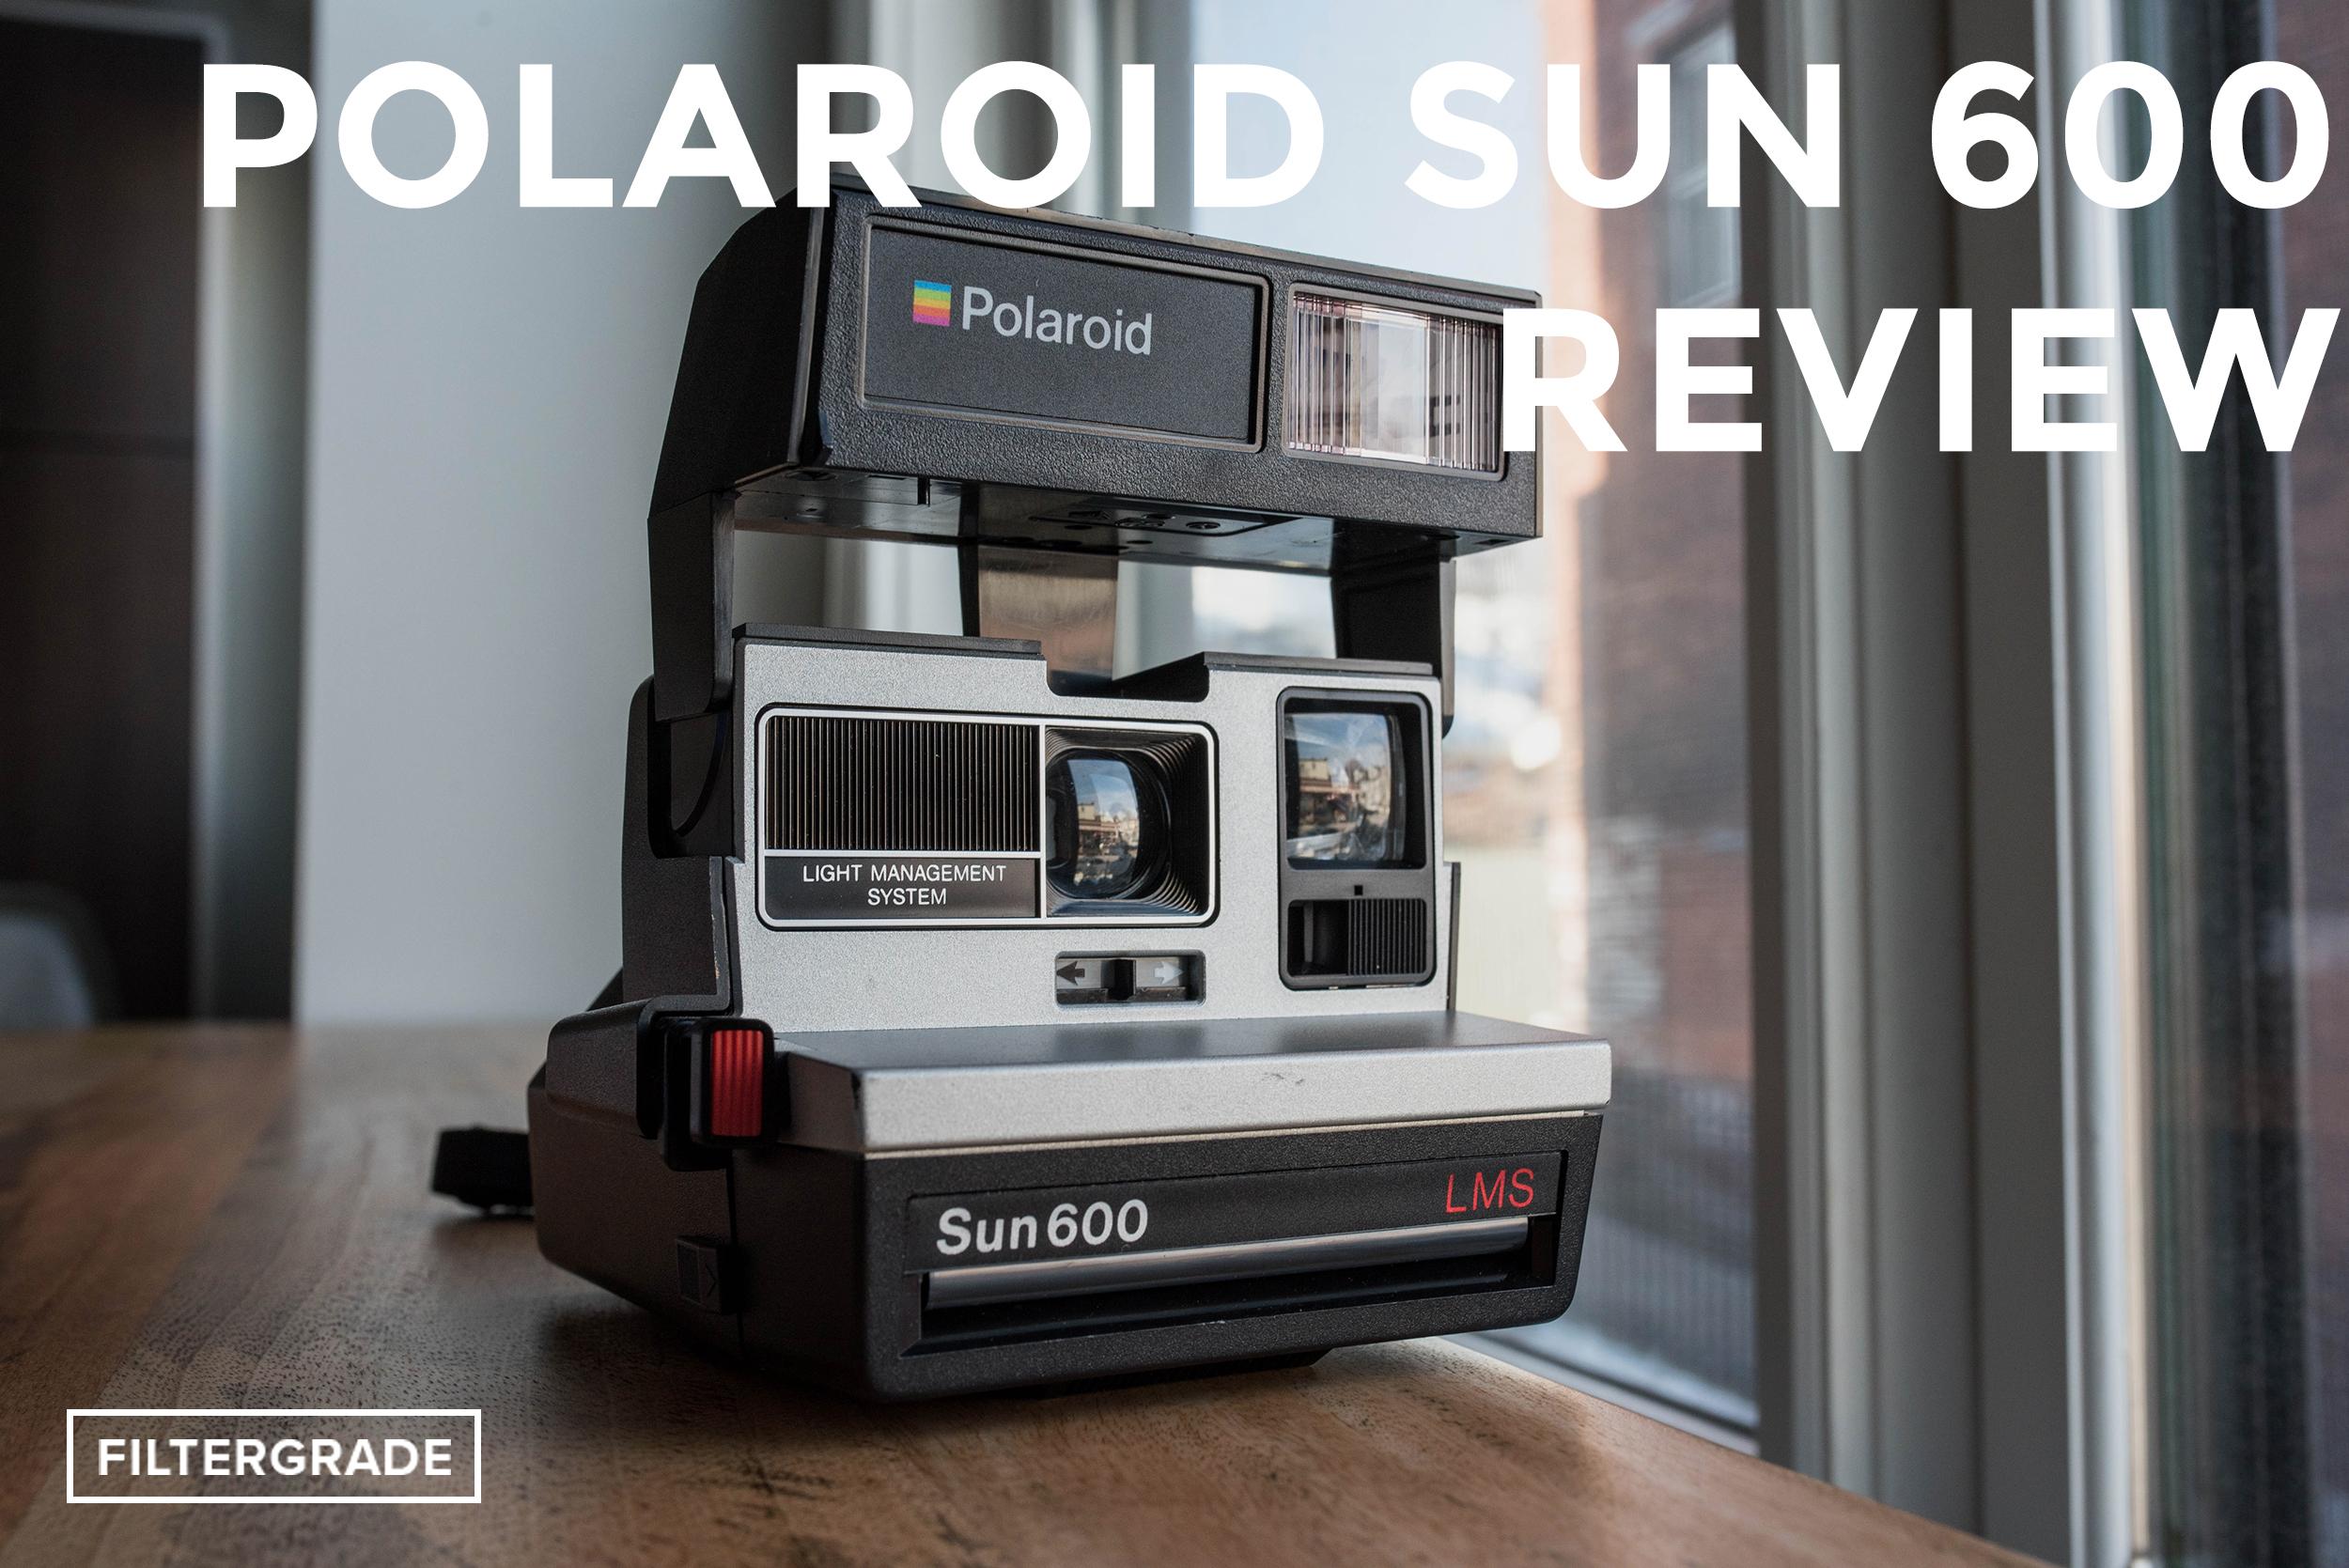 Polaroid Sun 600 Instant Film Camera Review - FilterGrade